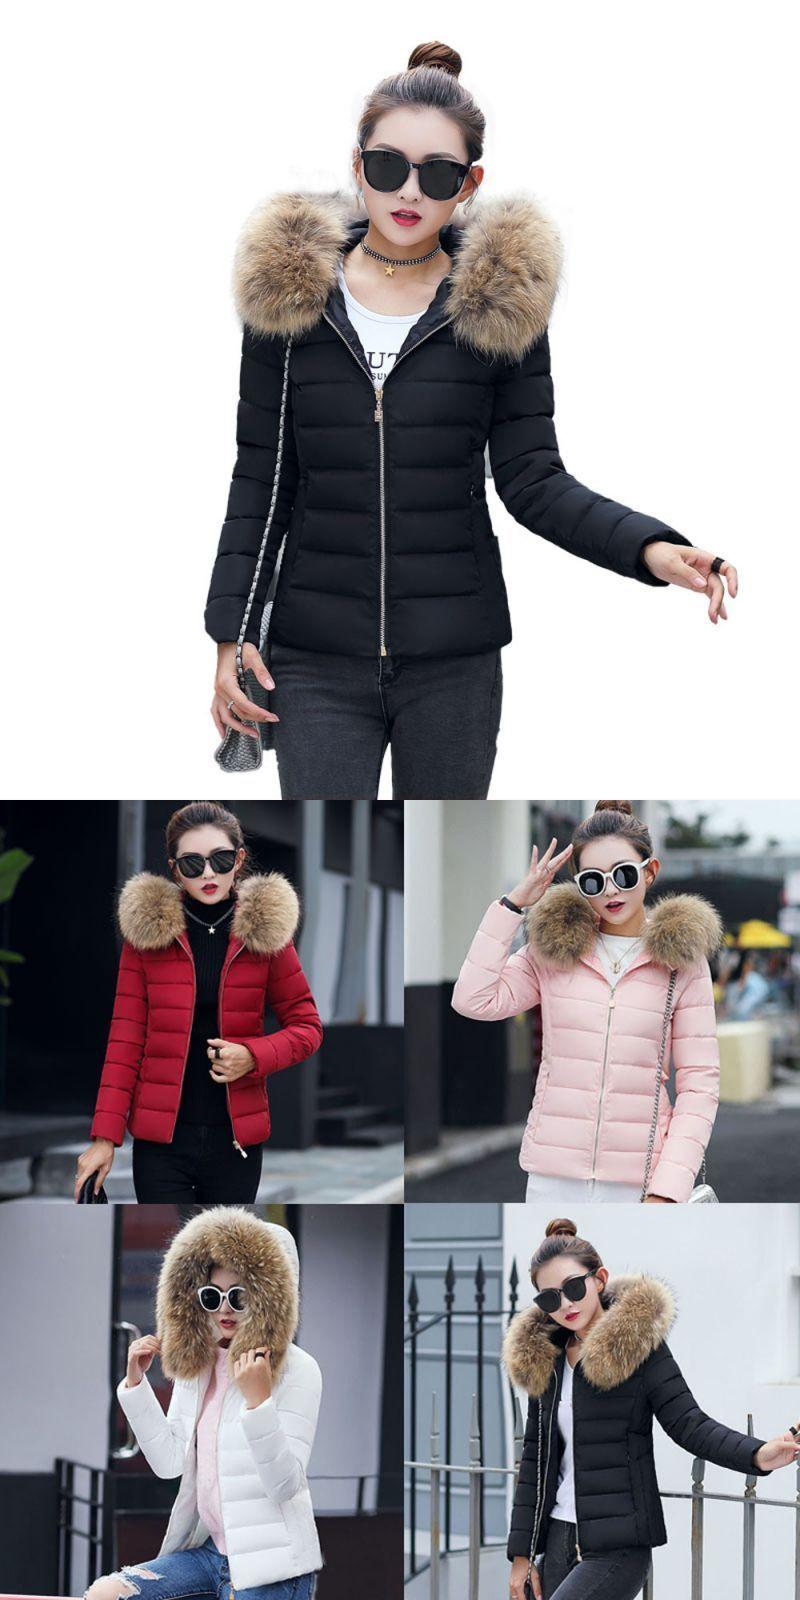 b7afffe824c Women warm winter jackets fashion hooded fur collar parka down cotton coat  womens solid slim large size female down coats  women  full  standard   casual ...